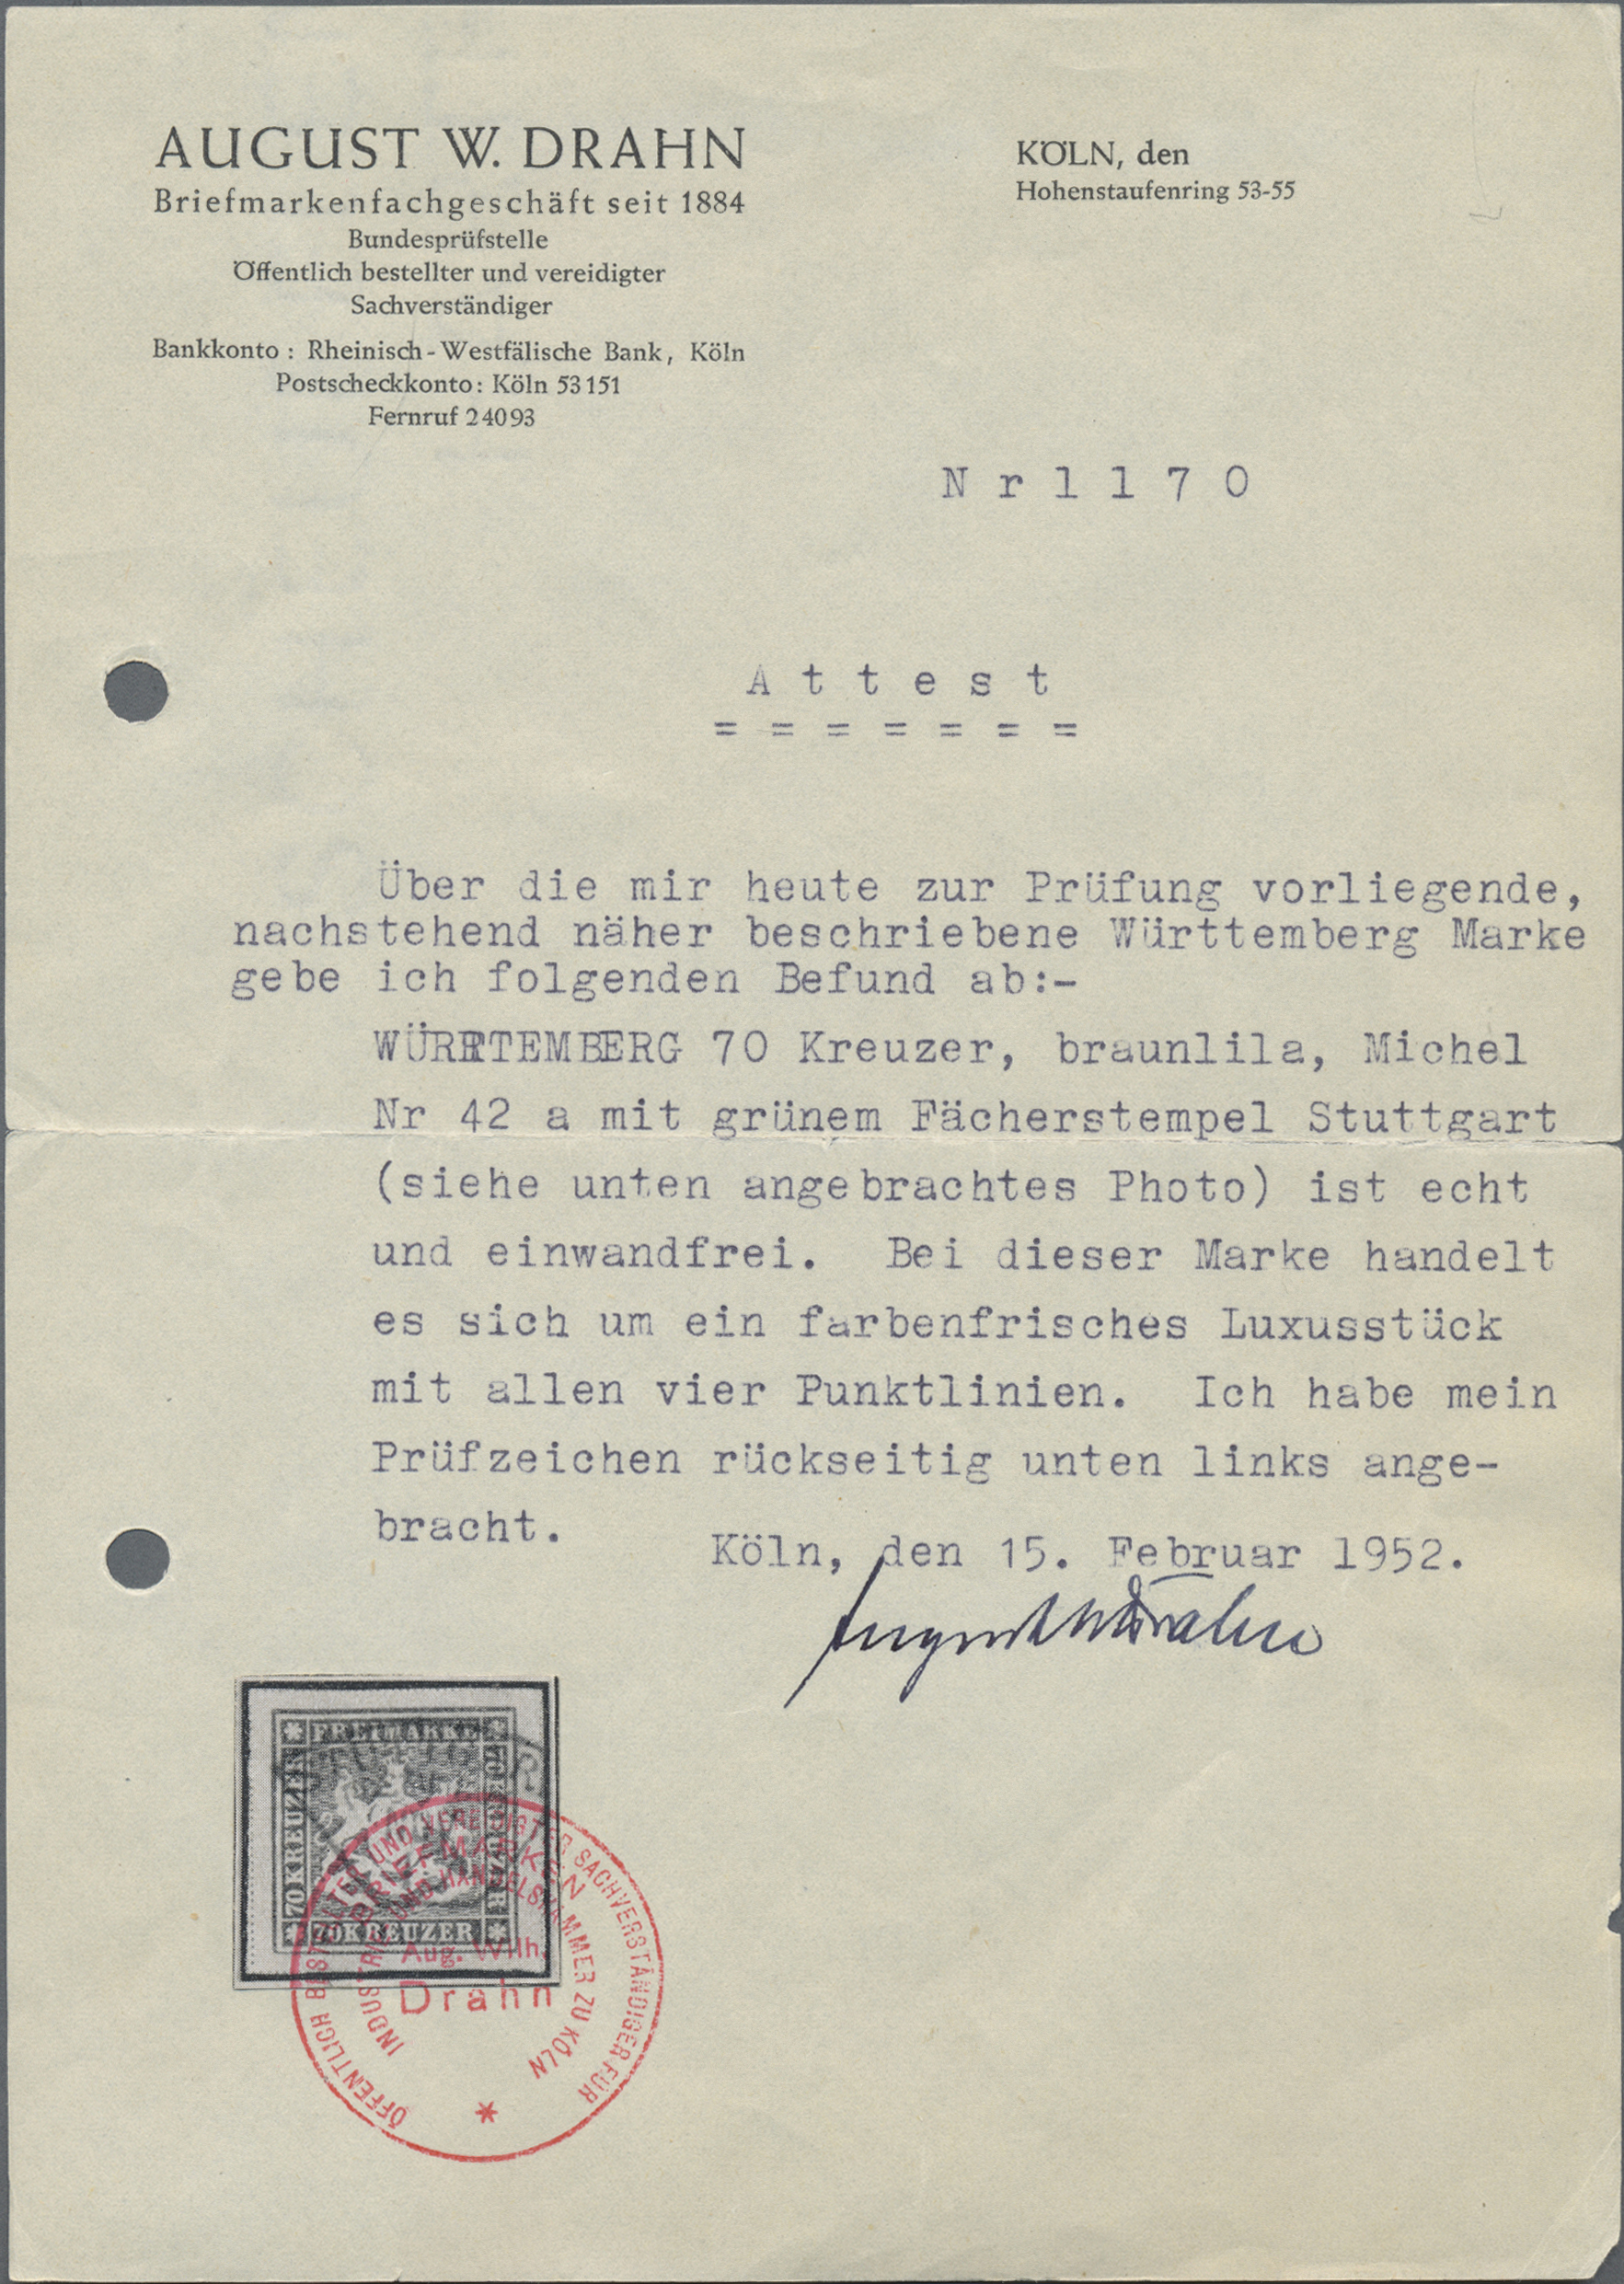 Lot 36337 - Württemberg - Marken und Briefe  -  Auktionshaus Christoph Gärtner GmbH & Co. KG Sale #44 Collections Germany